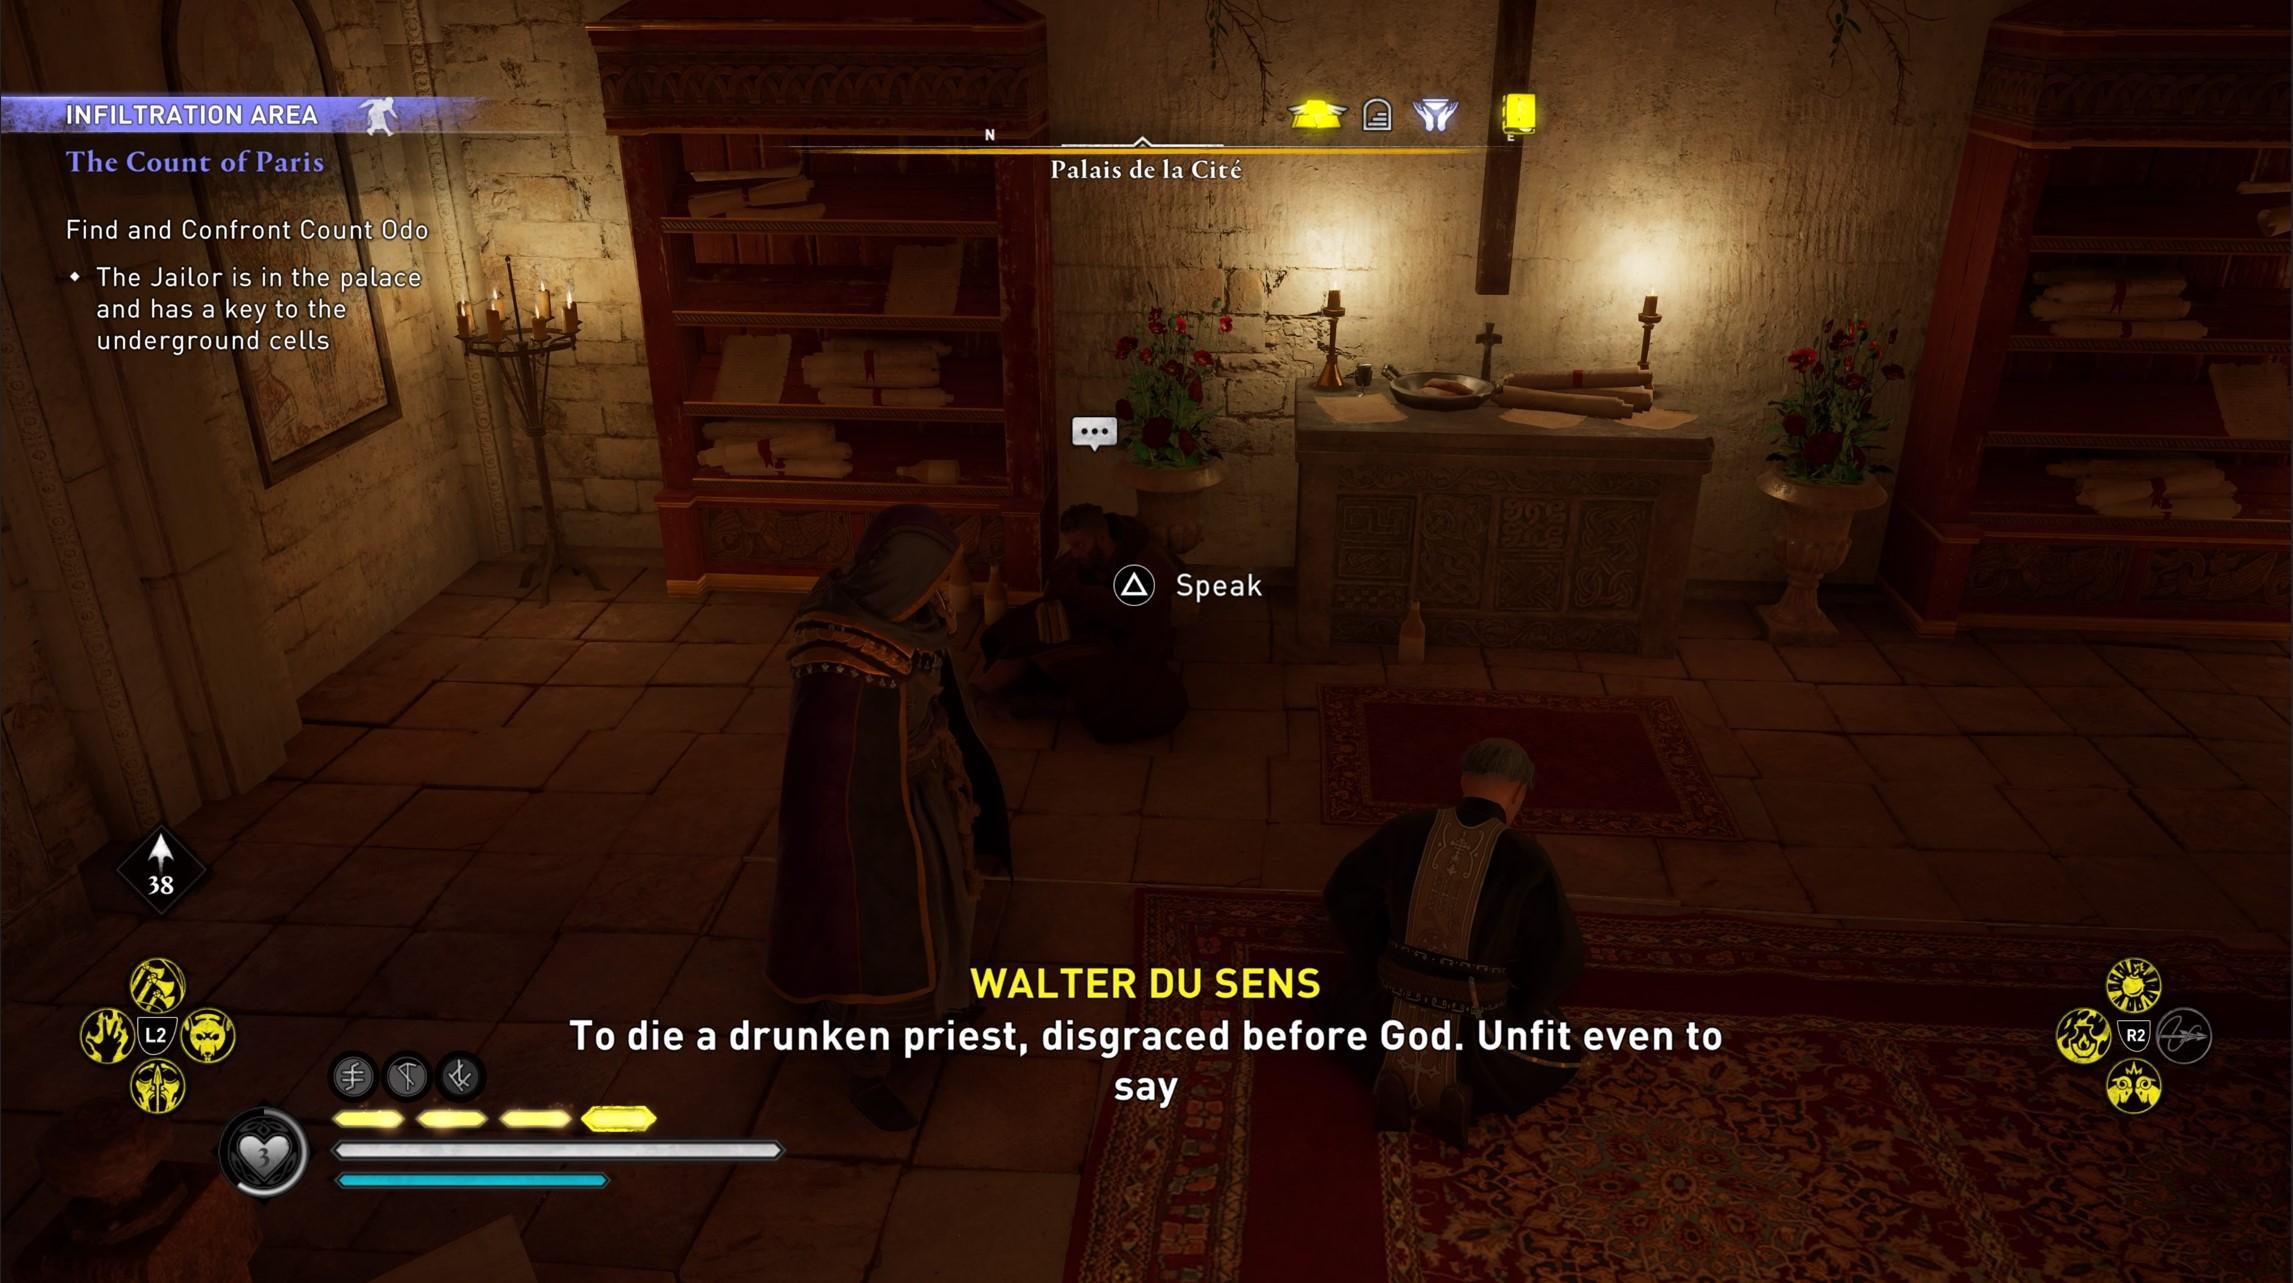 assassins creed valhalla count of paris confront odo walter du sens Assassin's Creed Valhalla Siege of Paris The Count of Paris | Confront Odo